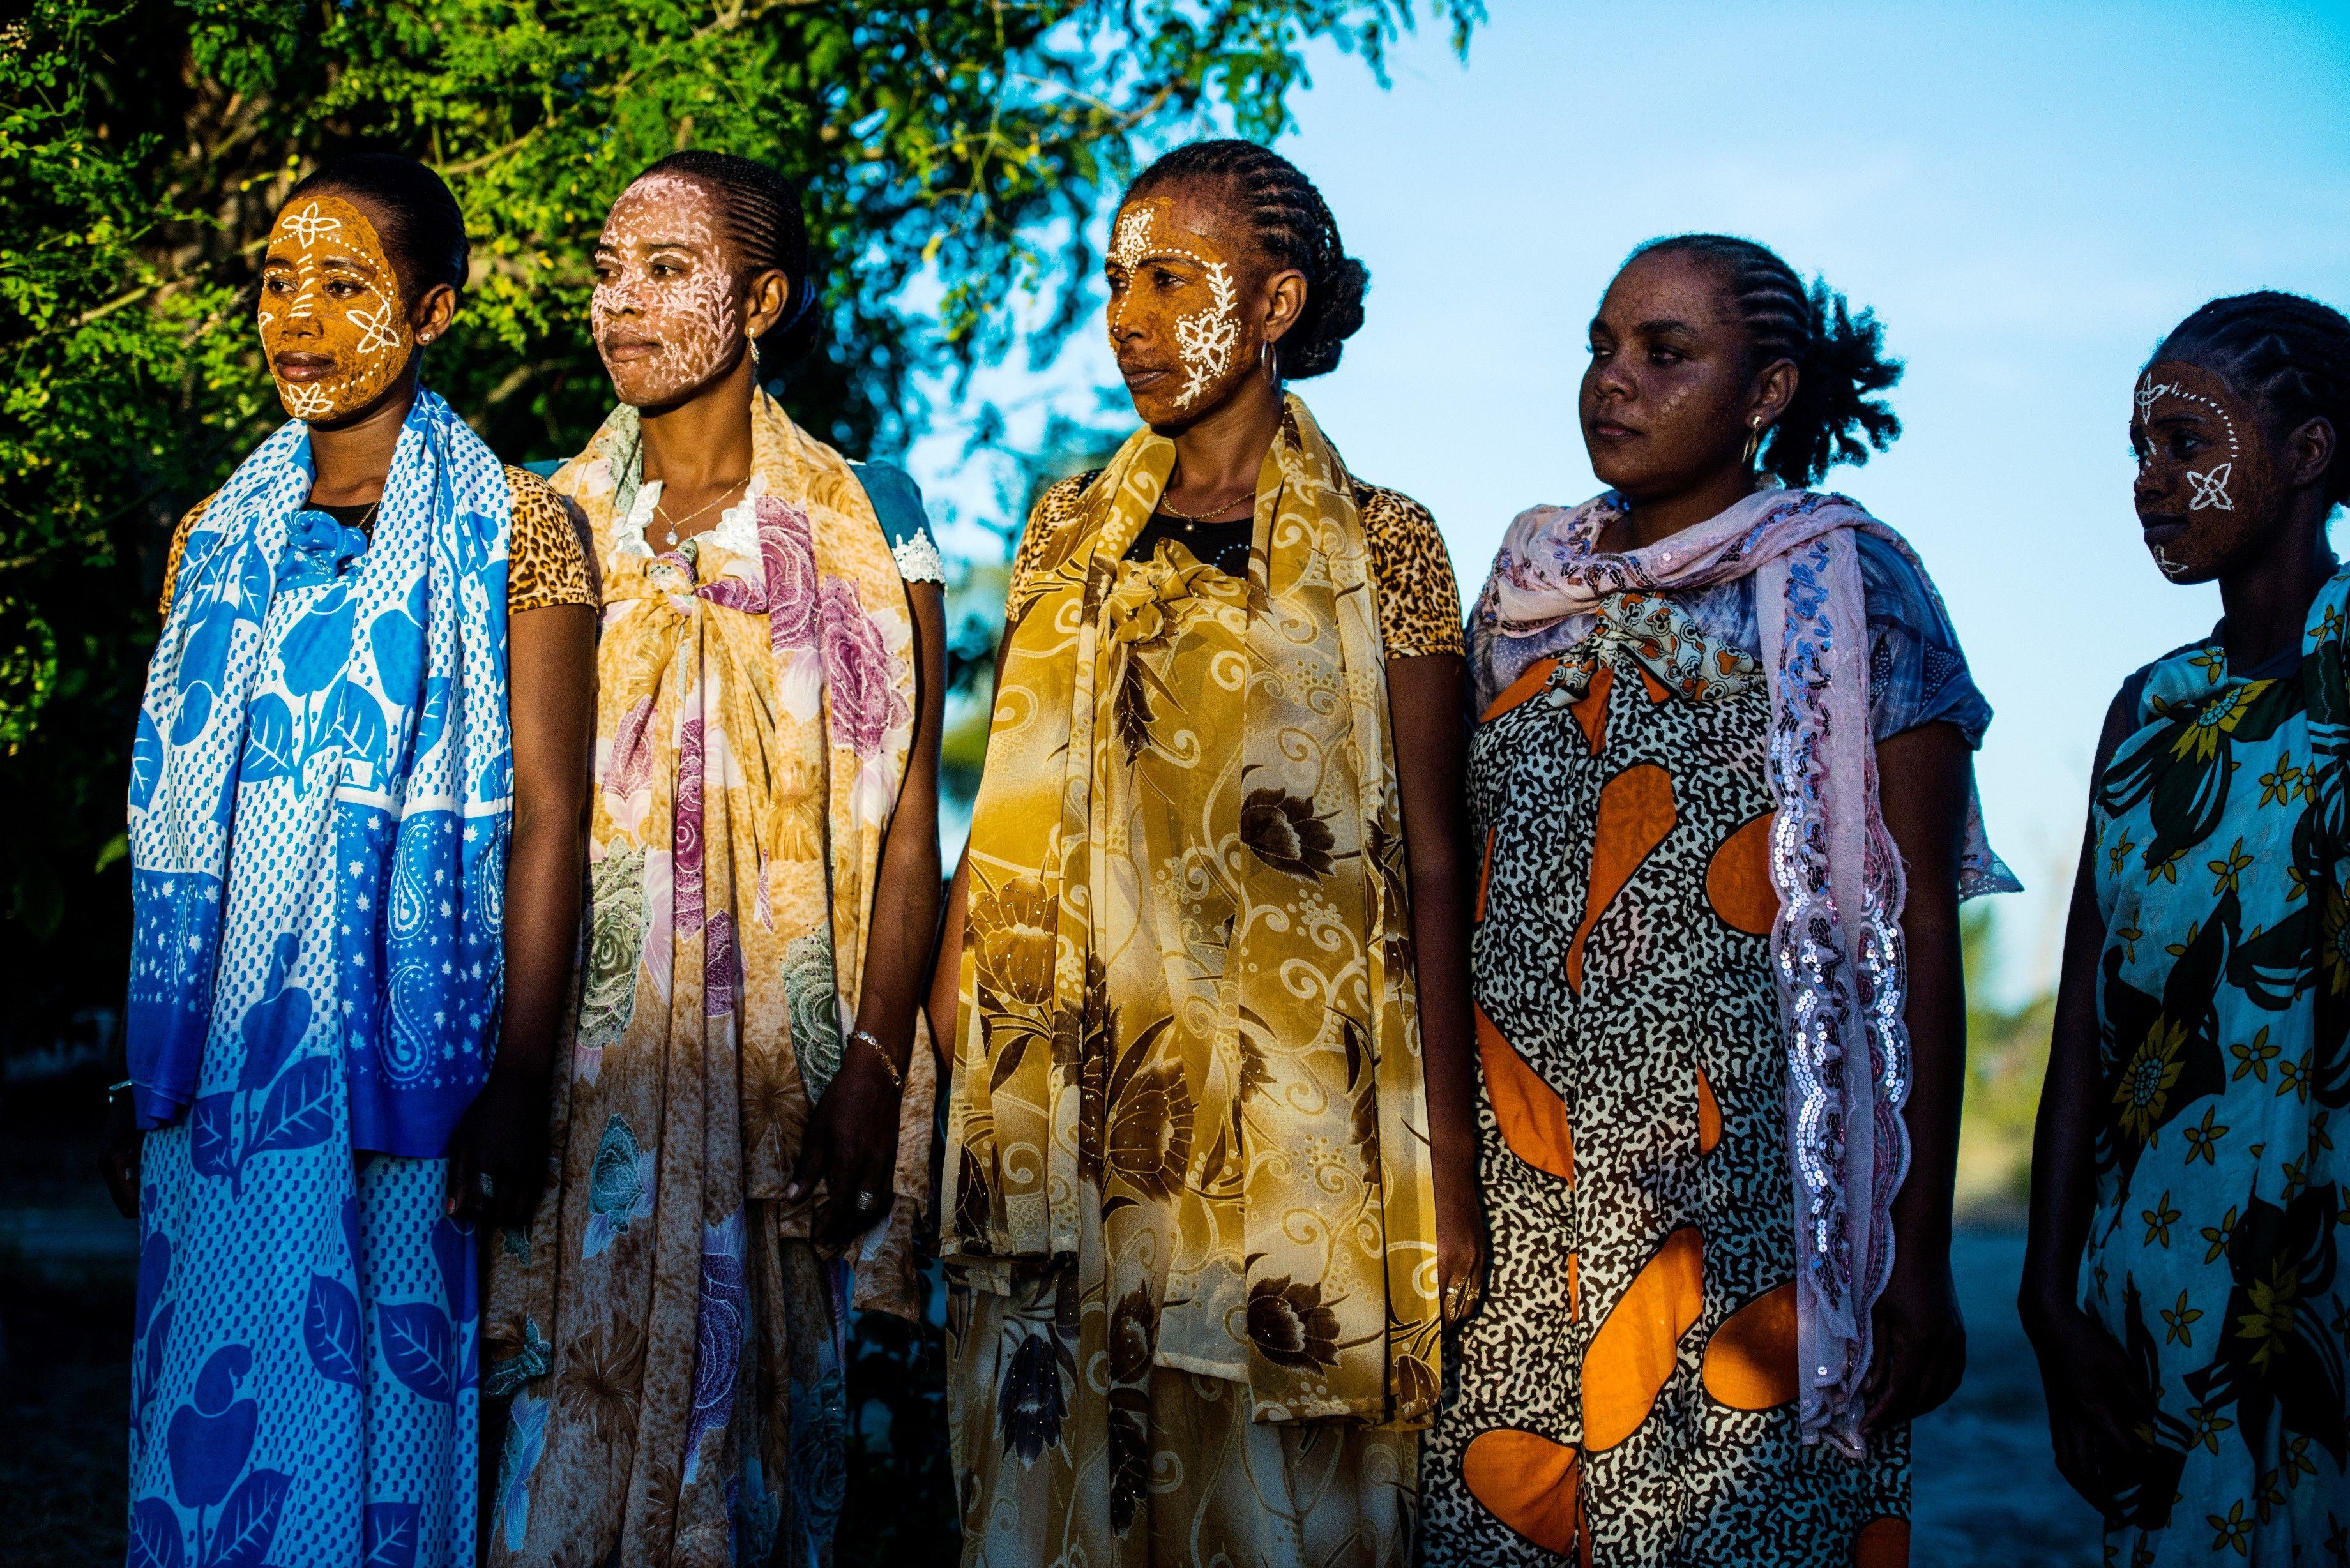 Luxury Resort Miavana, Nosy Ankao, Madagascar. Luxury resort in Madagascar - www.casalio.com - #safari #madagascar #villa #luxuryvilla #luxurytravel #safarivilla #casalio v